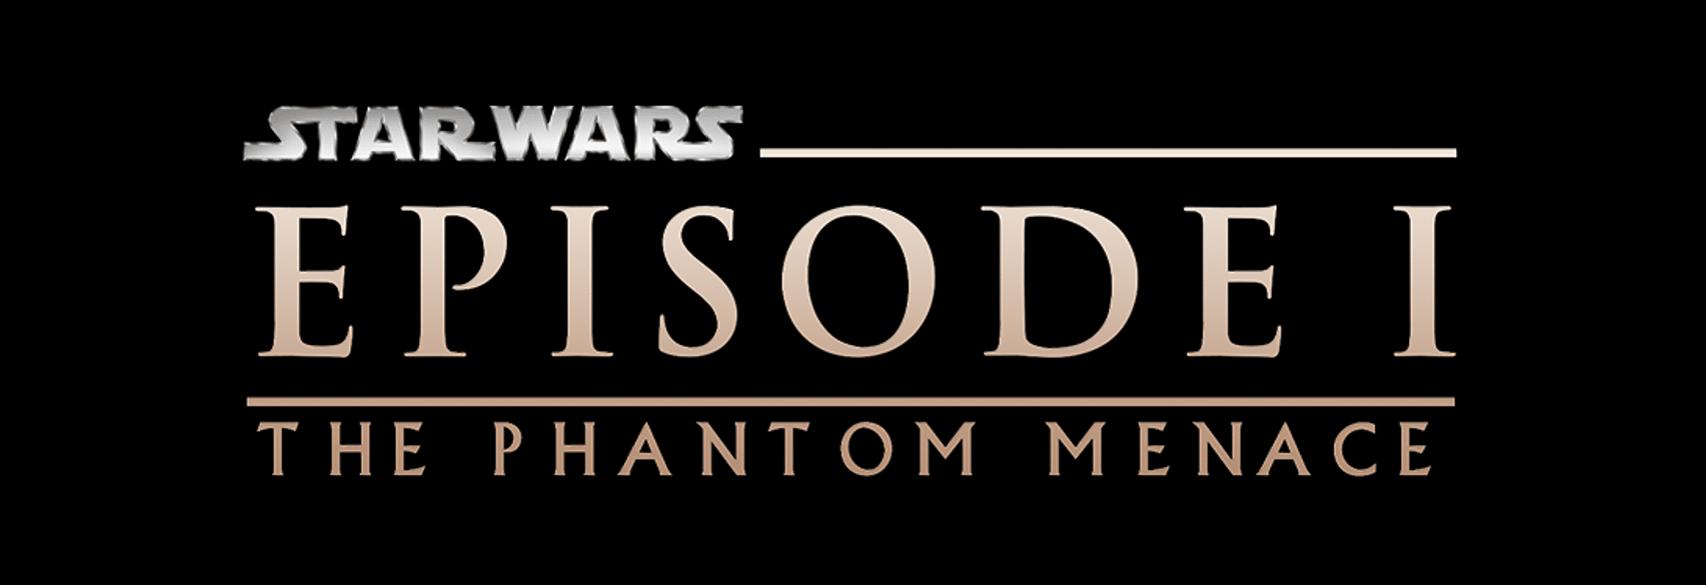 Star Wars: The Phantom Menace – Retro Review | What's On Disney Plus